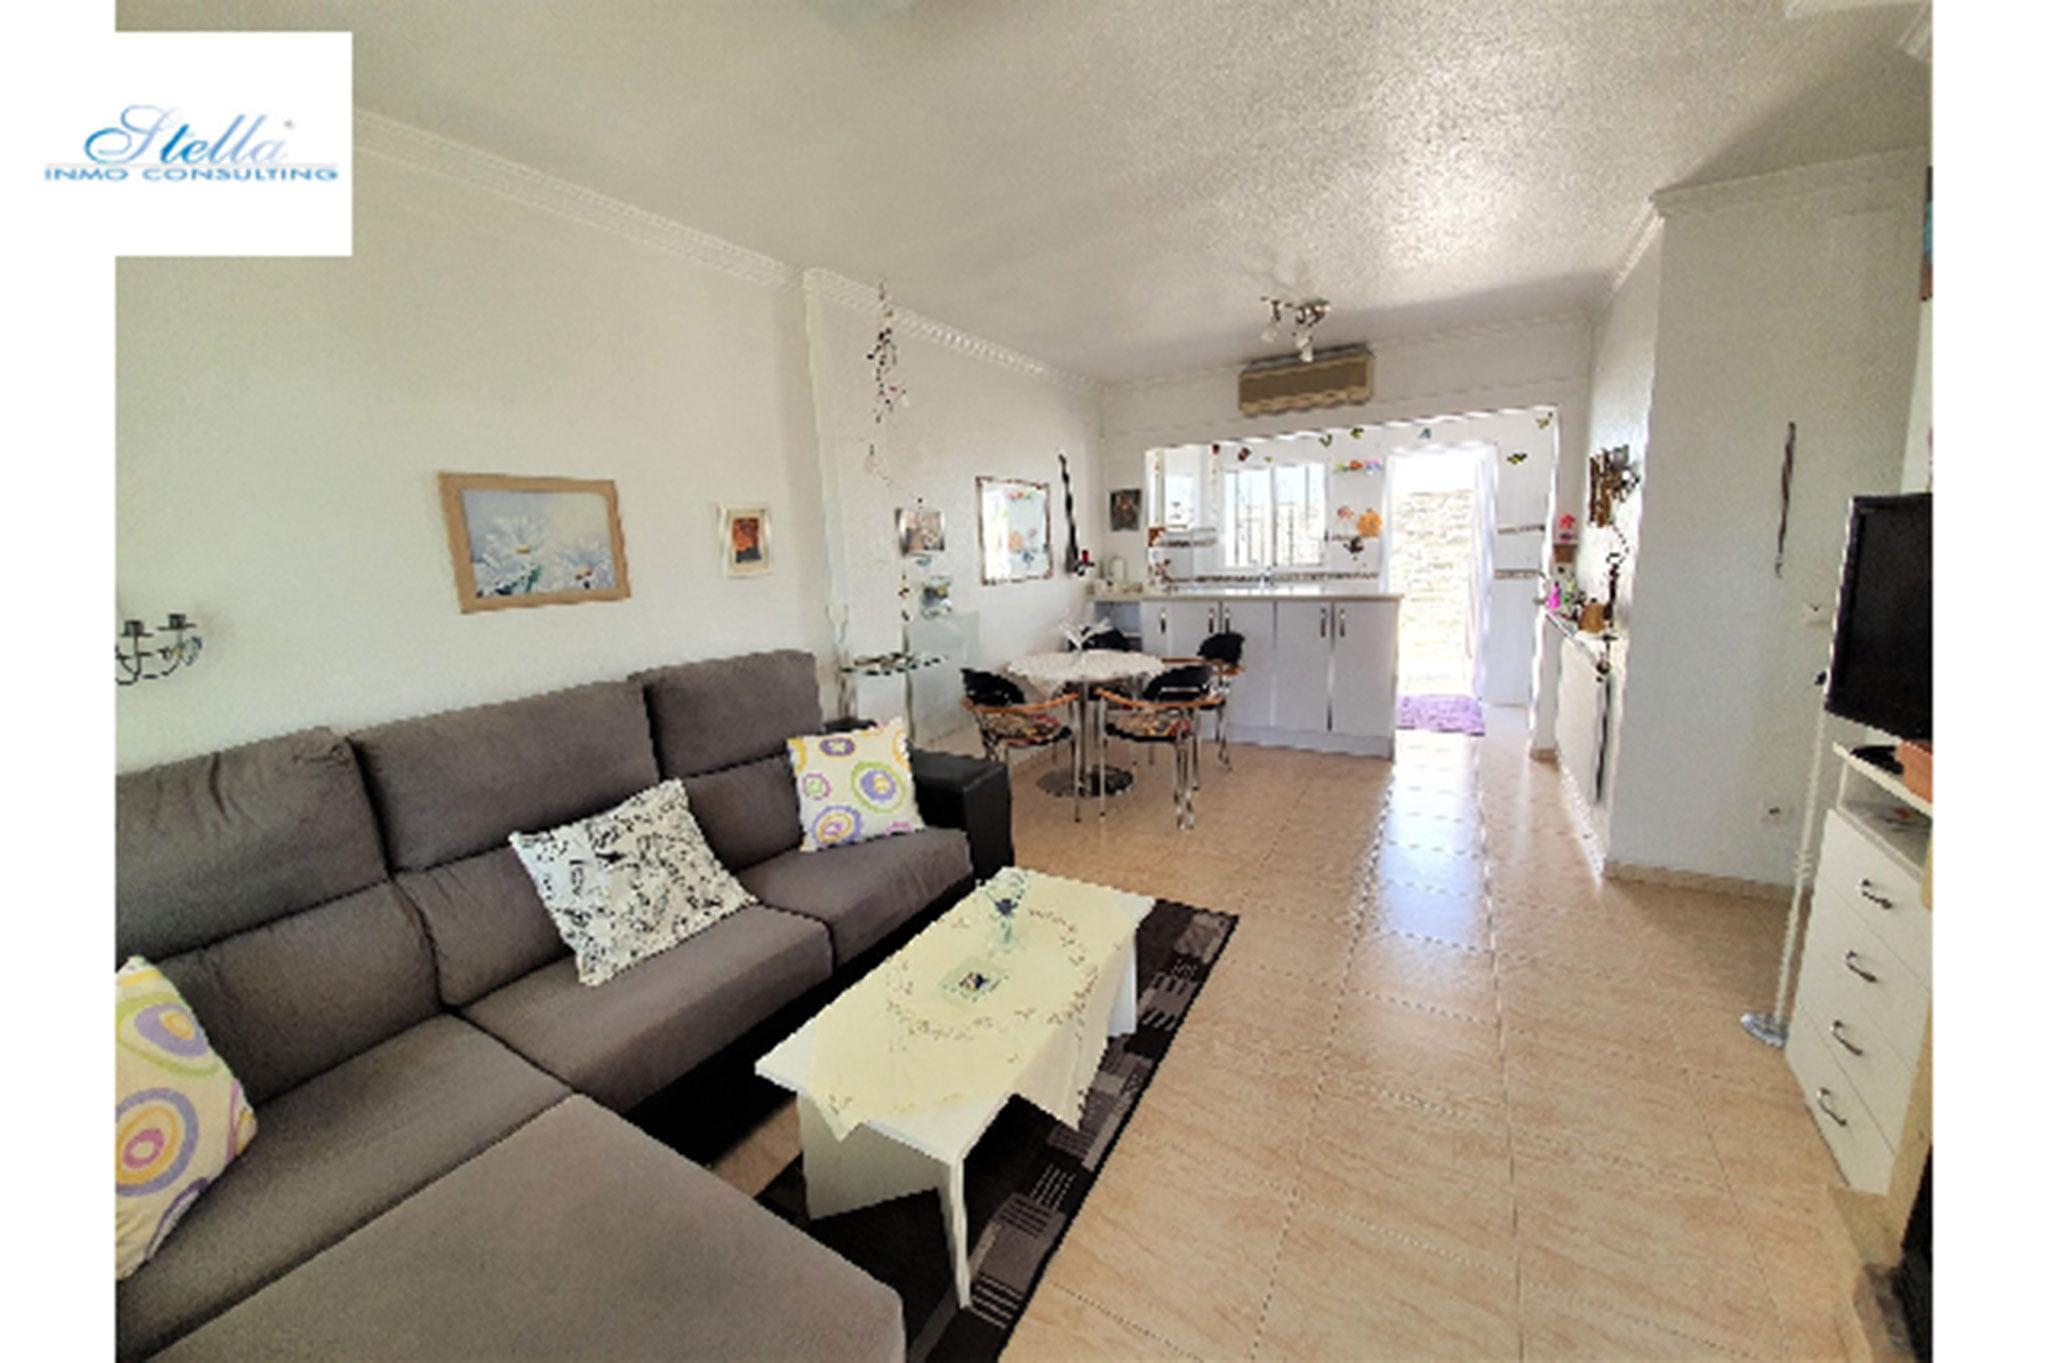 Saló d'una casa en venda a Verger - Stella Inmo Consulting